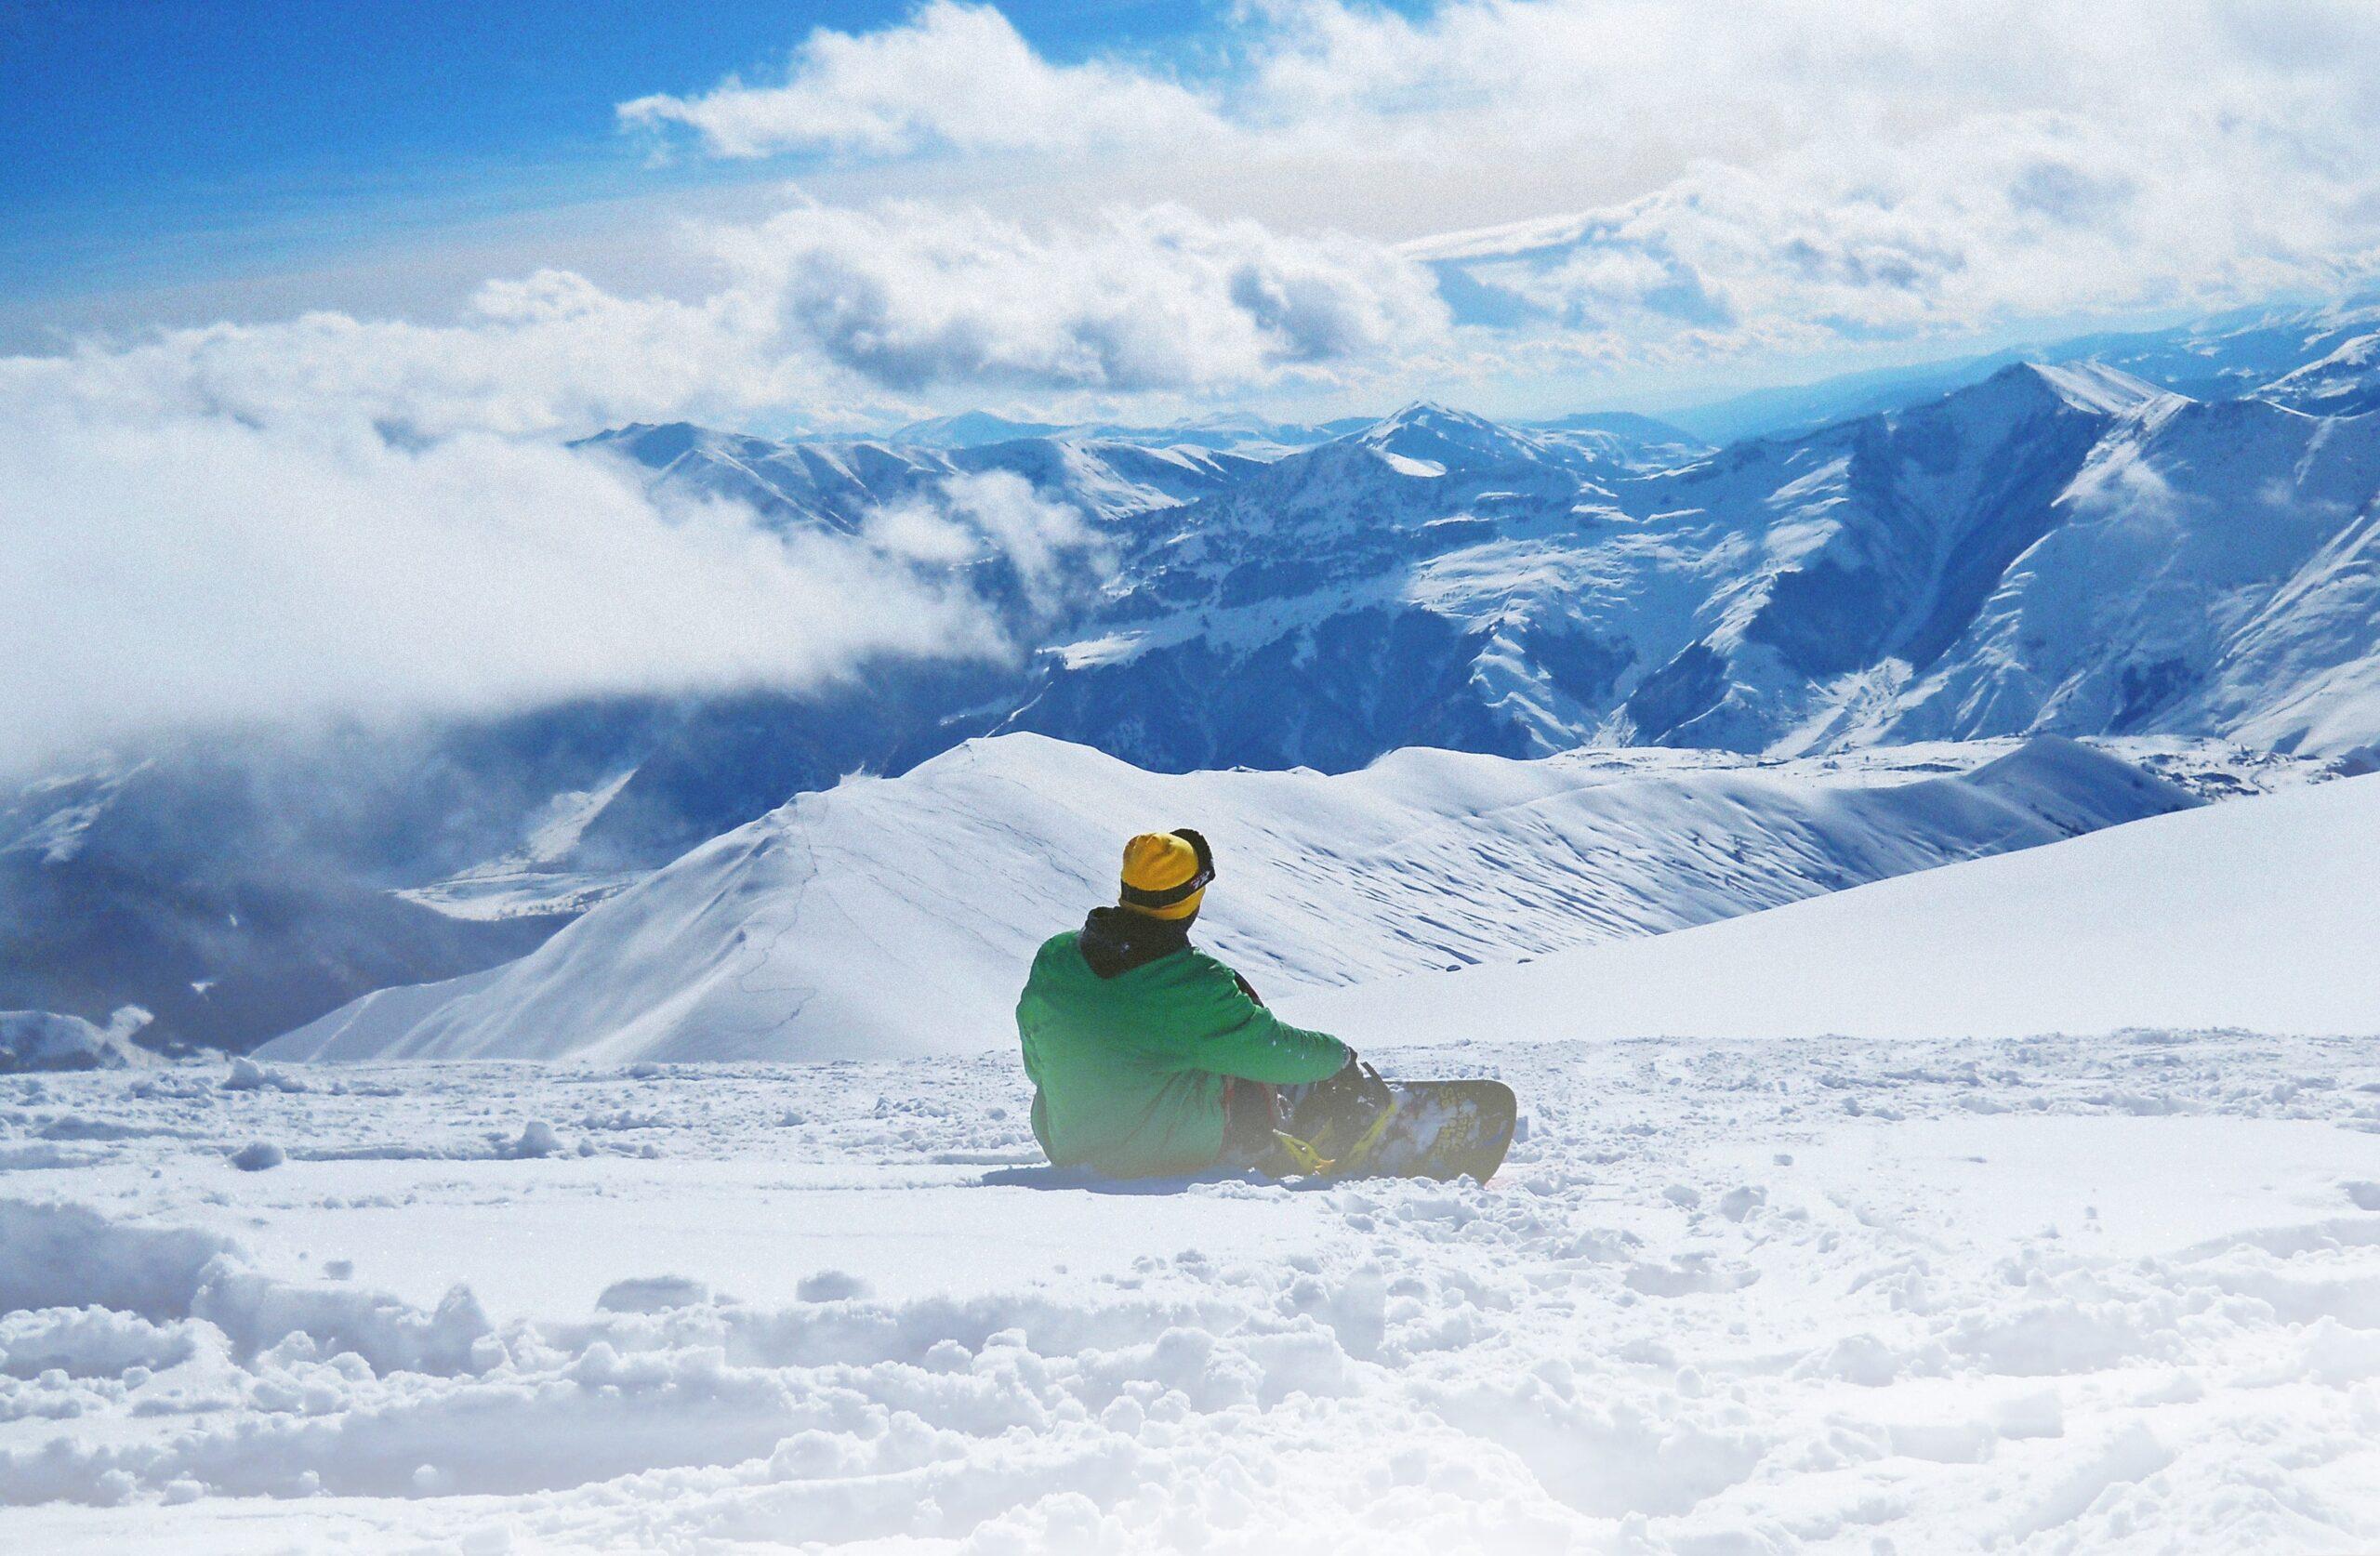 snowboarder on Chamonix Snowboard